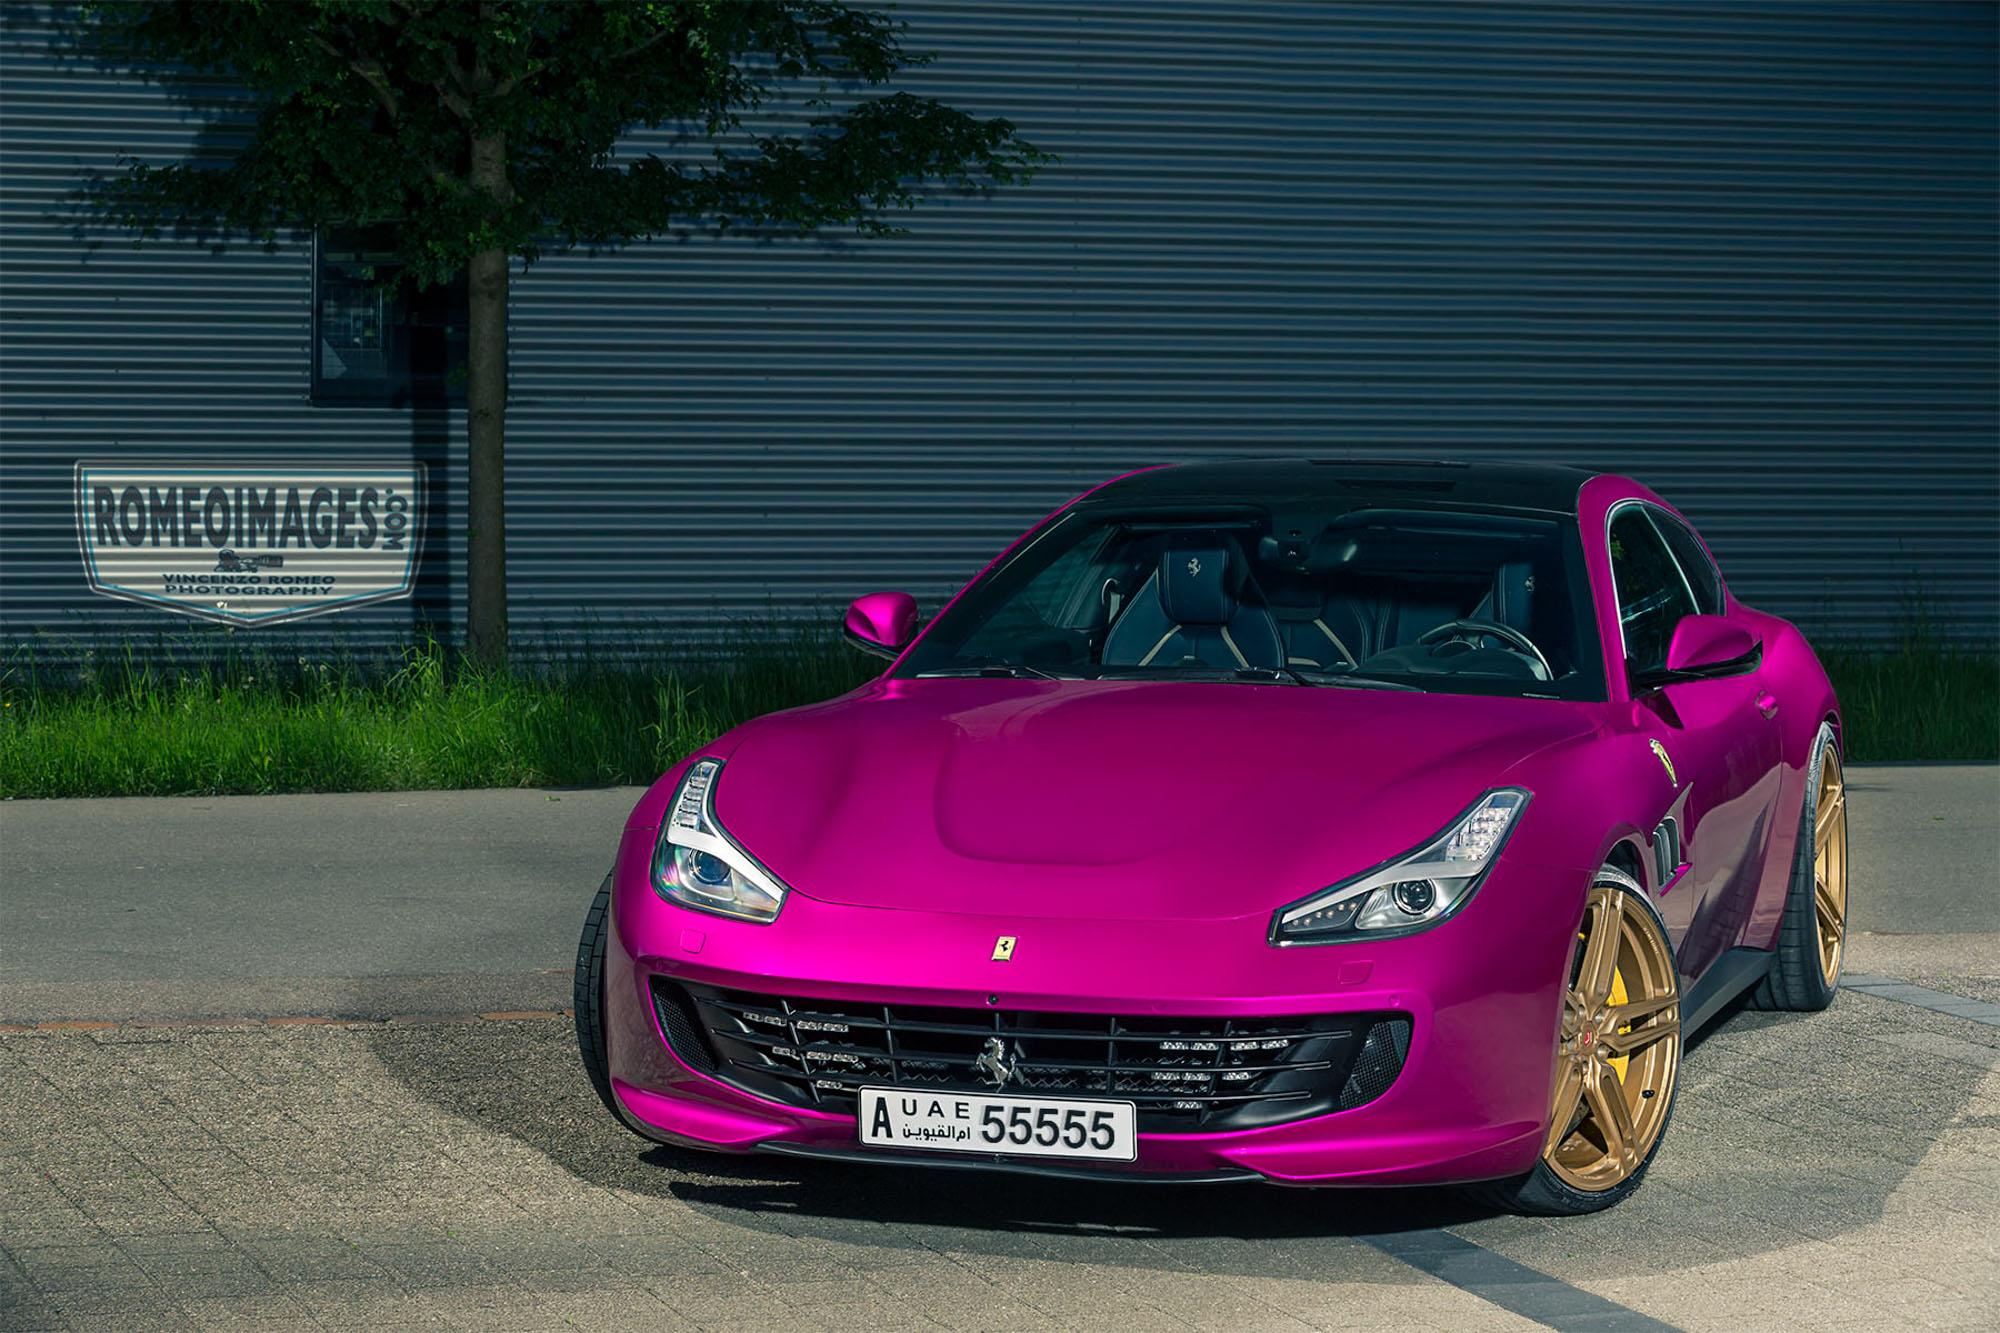 Purple Ferrari Gtc4lusso On Gold Vossen Wheels Has All The Opulence Autoevolution